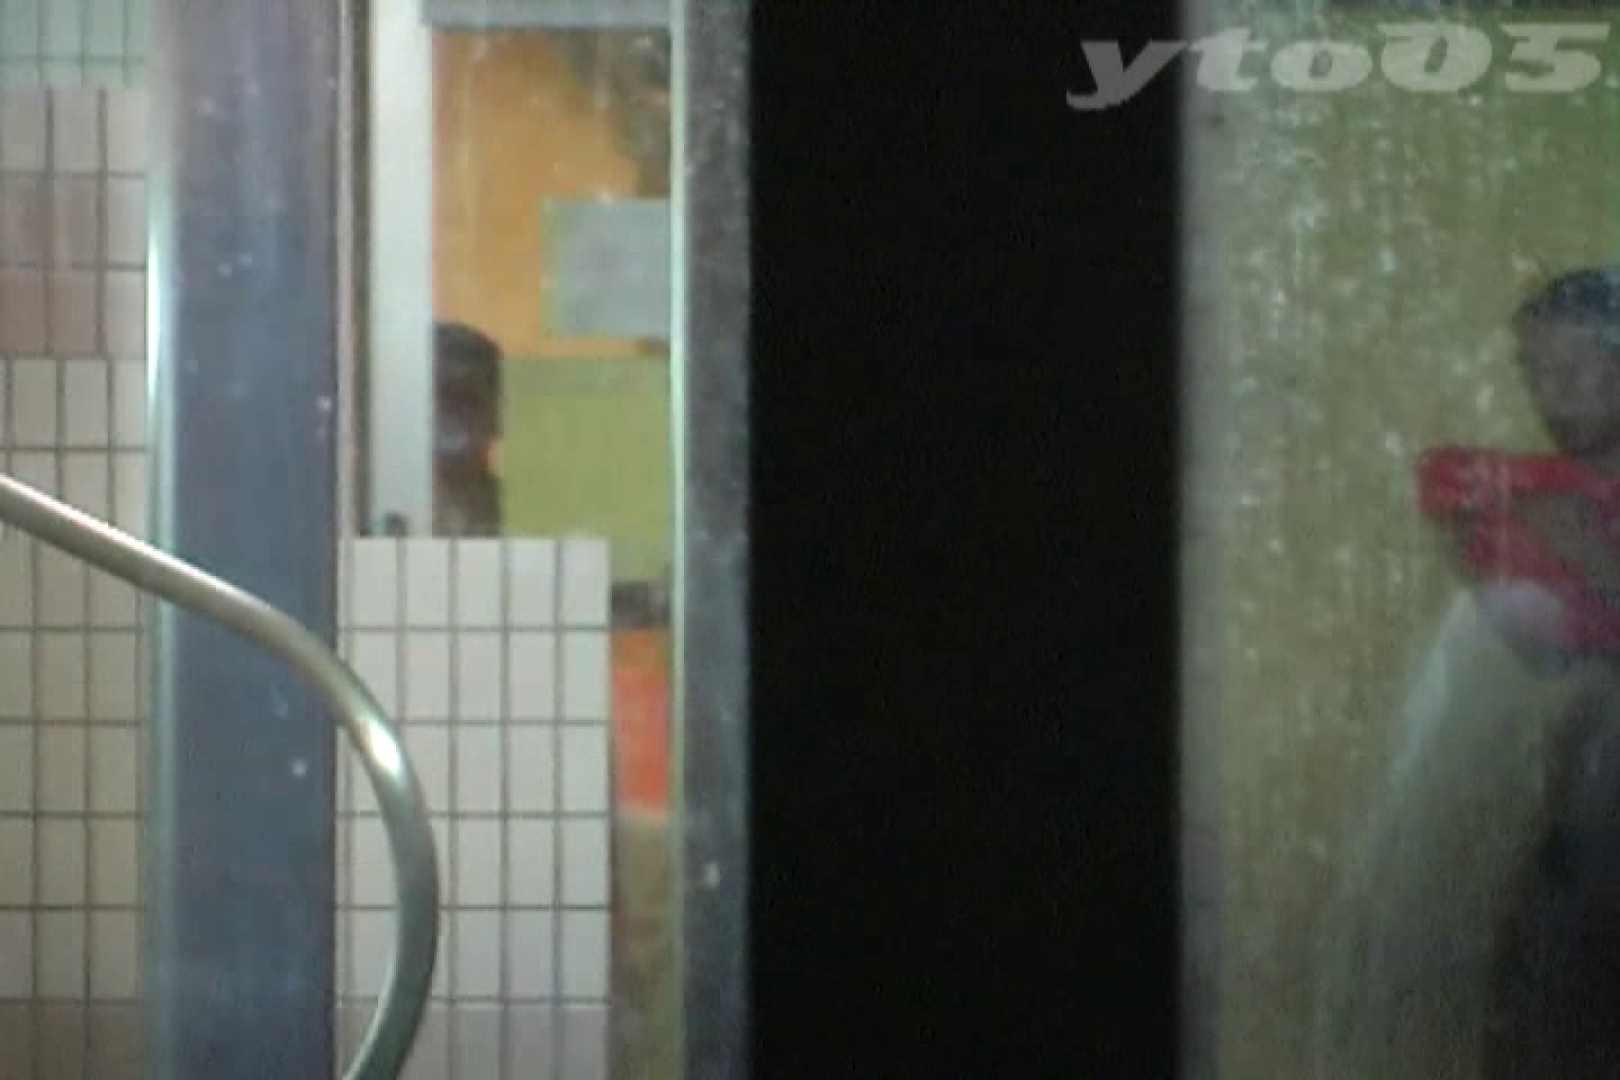 ▲復活限定▲合宿ホテル女風呂盗撮 Vol.31 0 | 0  84連発 65